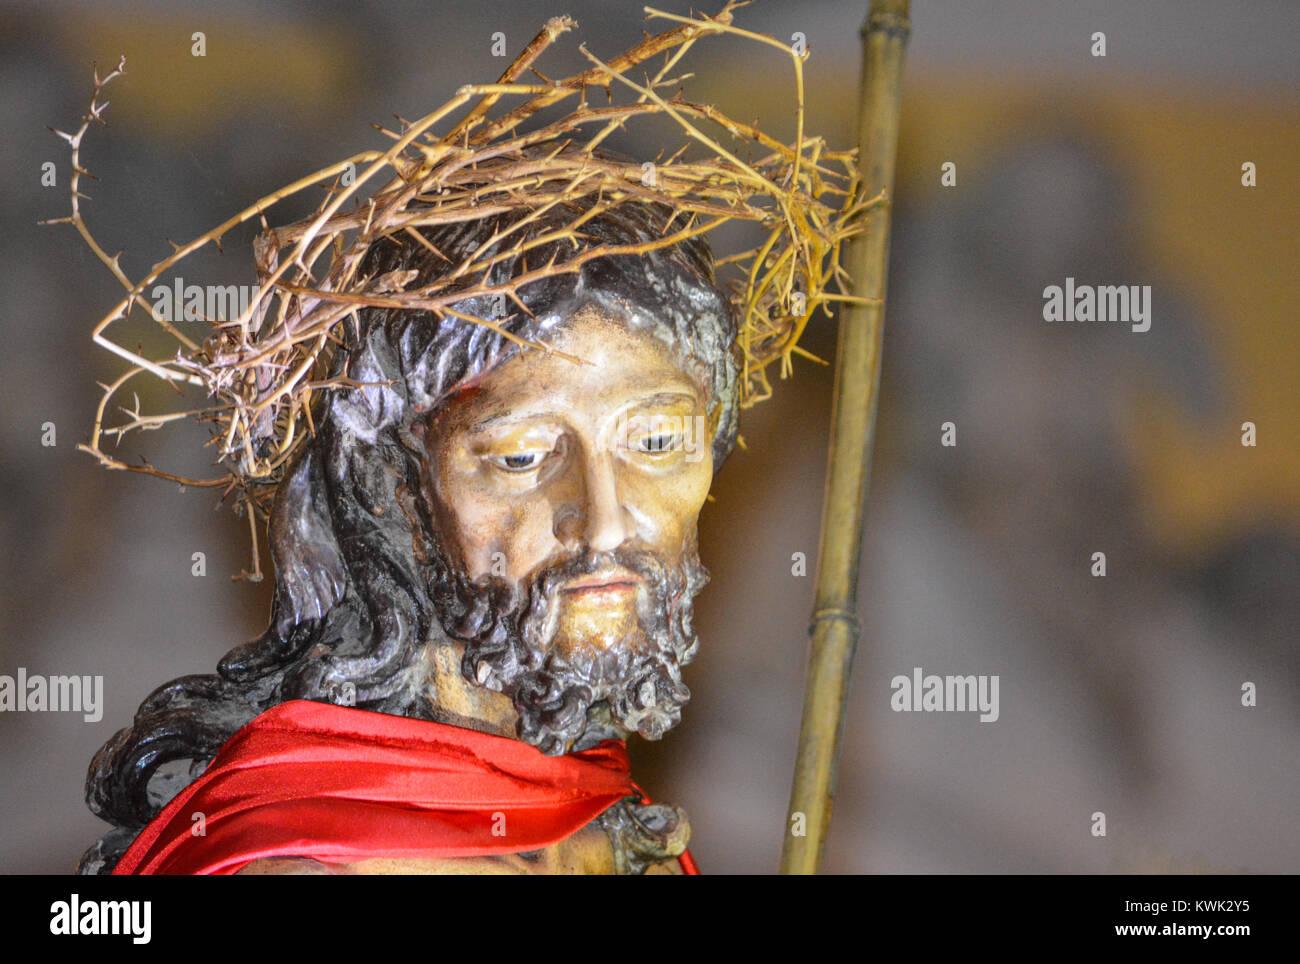 Statue of Jesus Christ in the Cathedral San Juan Bautista, Old San Juan, Puerto Rico Stock Photo